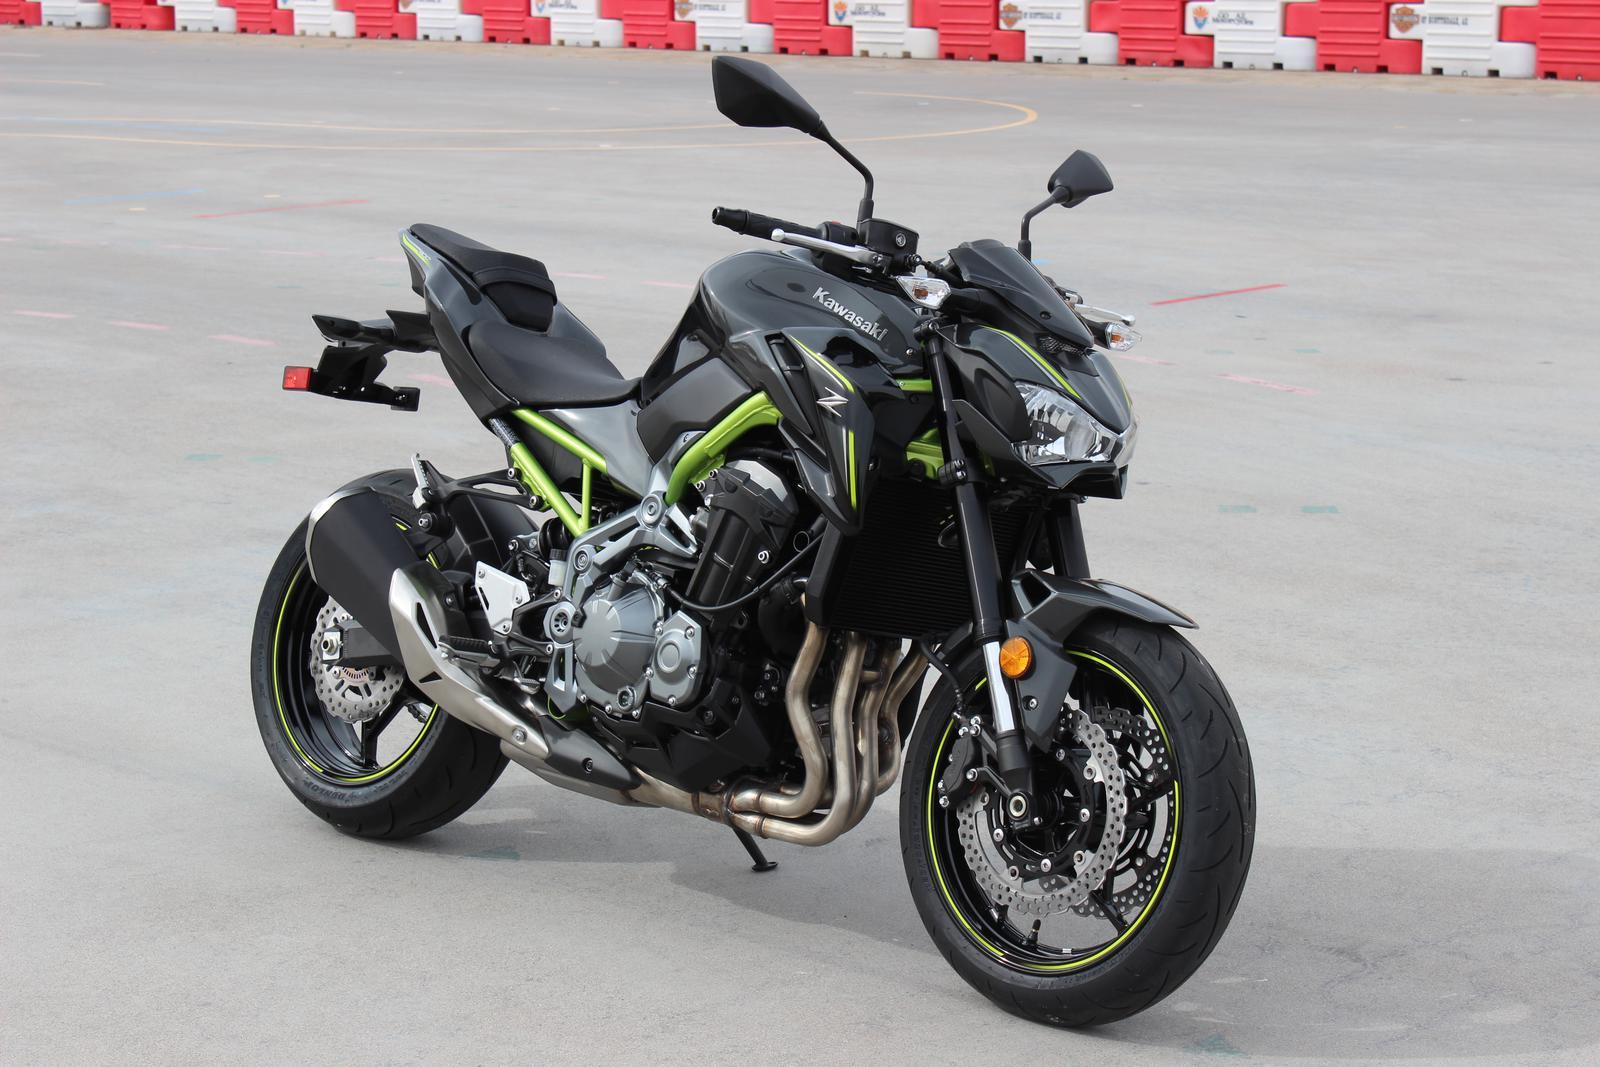 2017 kawasaki z900 for sale in scottsdale, az | go az motorcycles